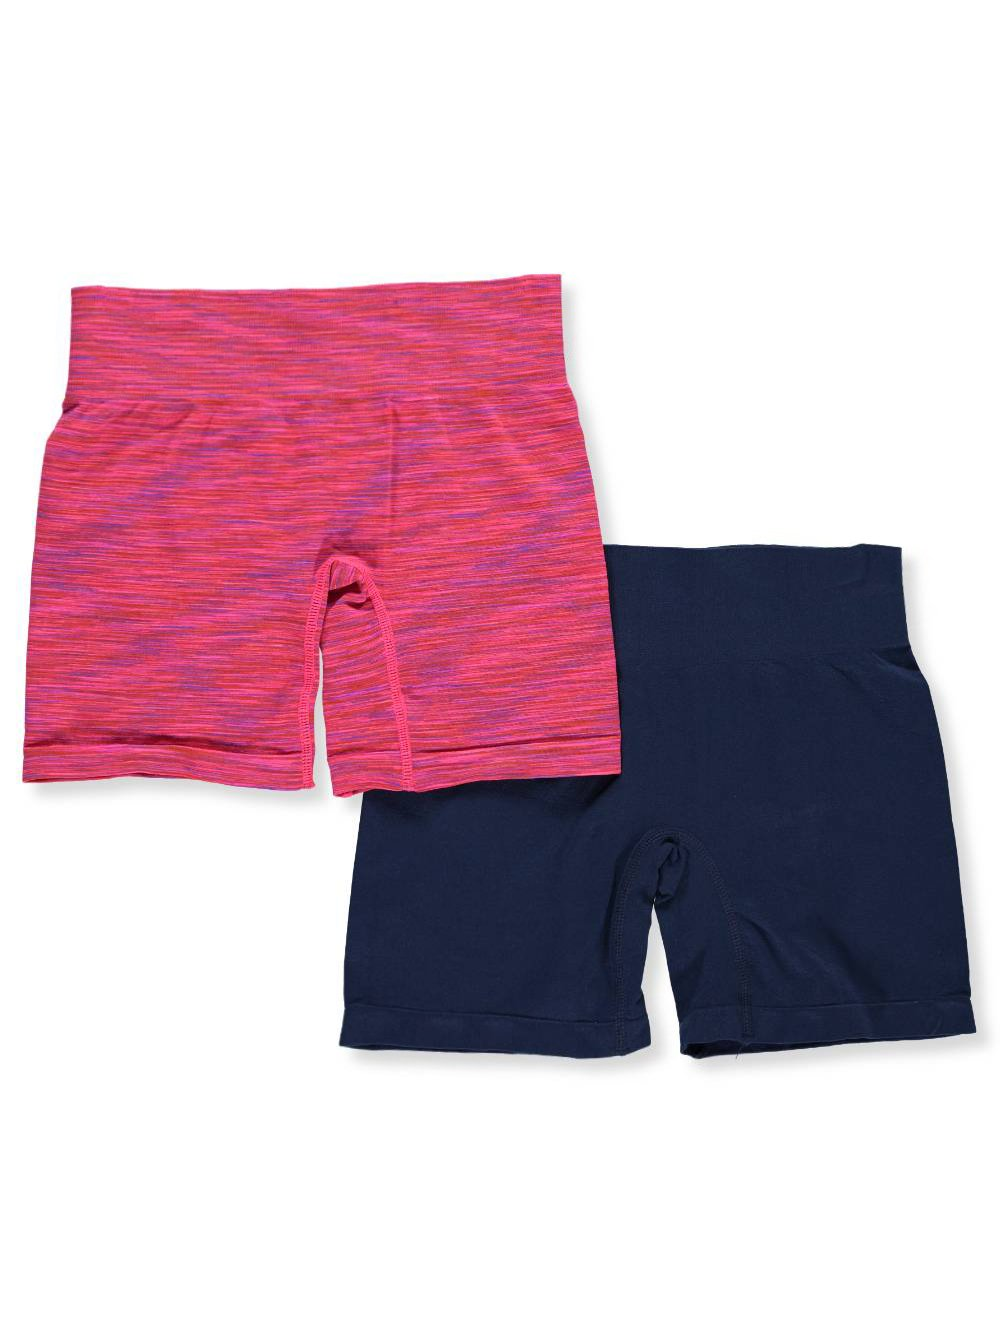 C & C Girls' 2-Pack Seamless Bike Shorts 12-14